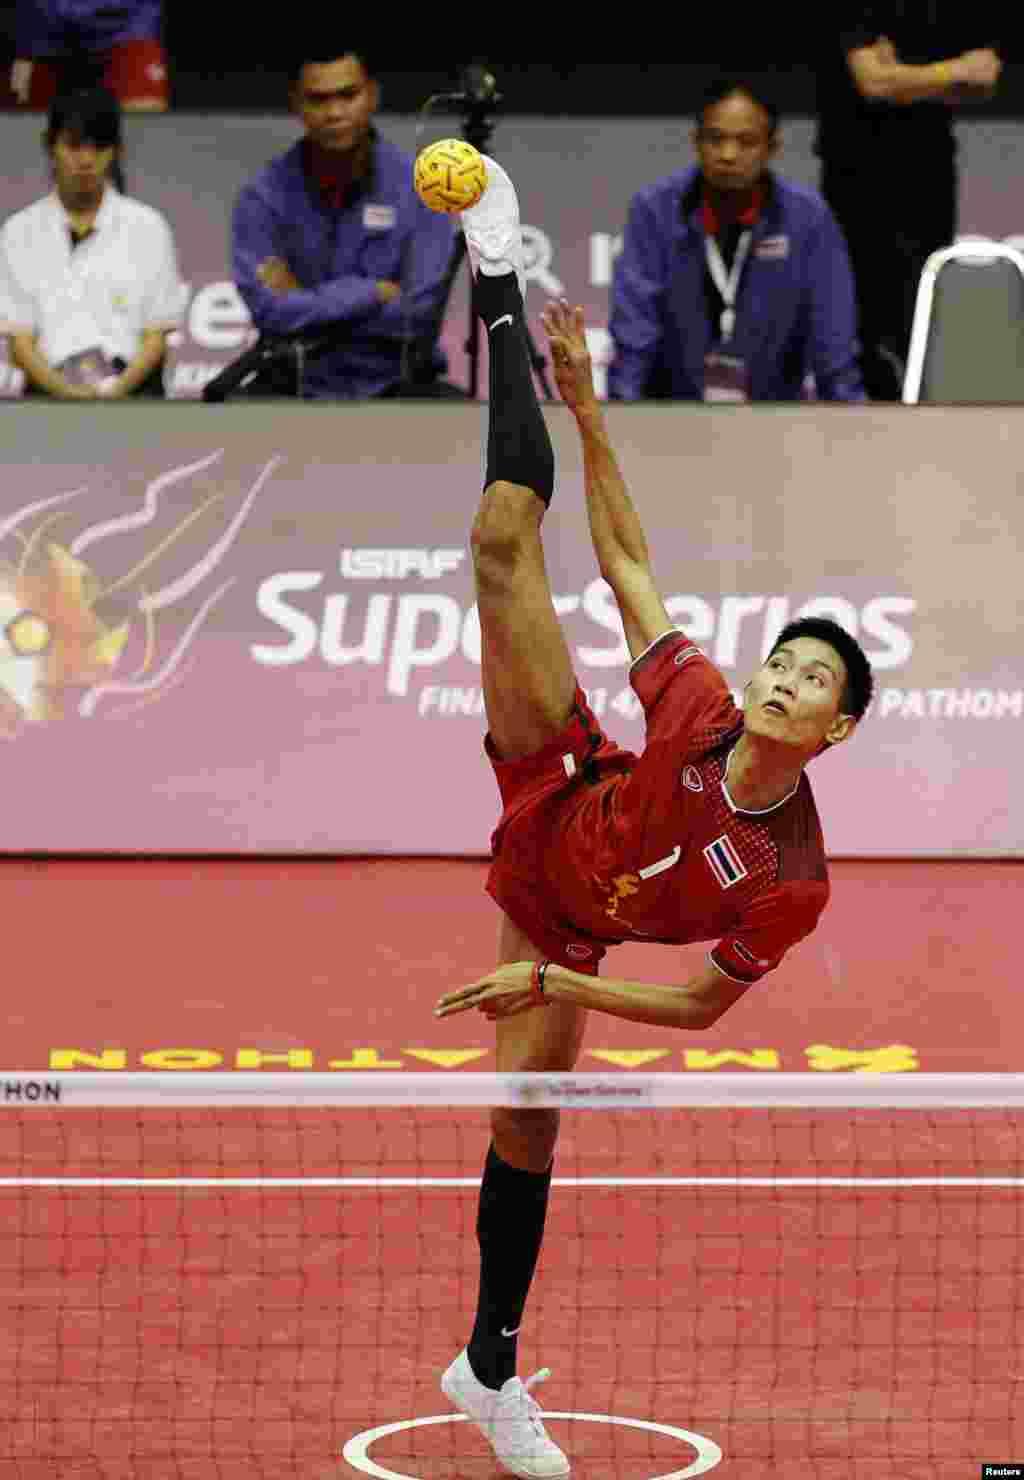 Tayland - ISTAF Super Series Finals Thailand 2014/2015